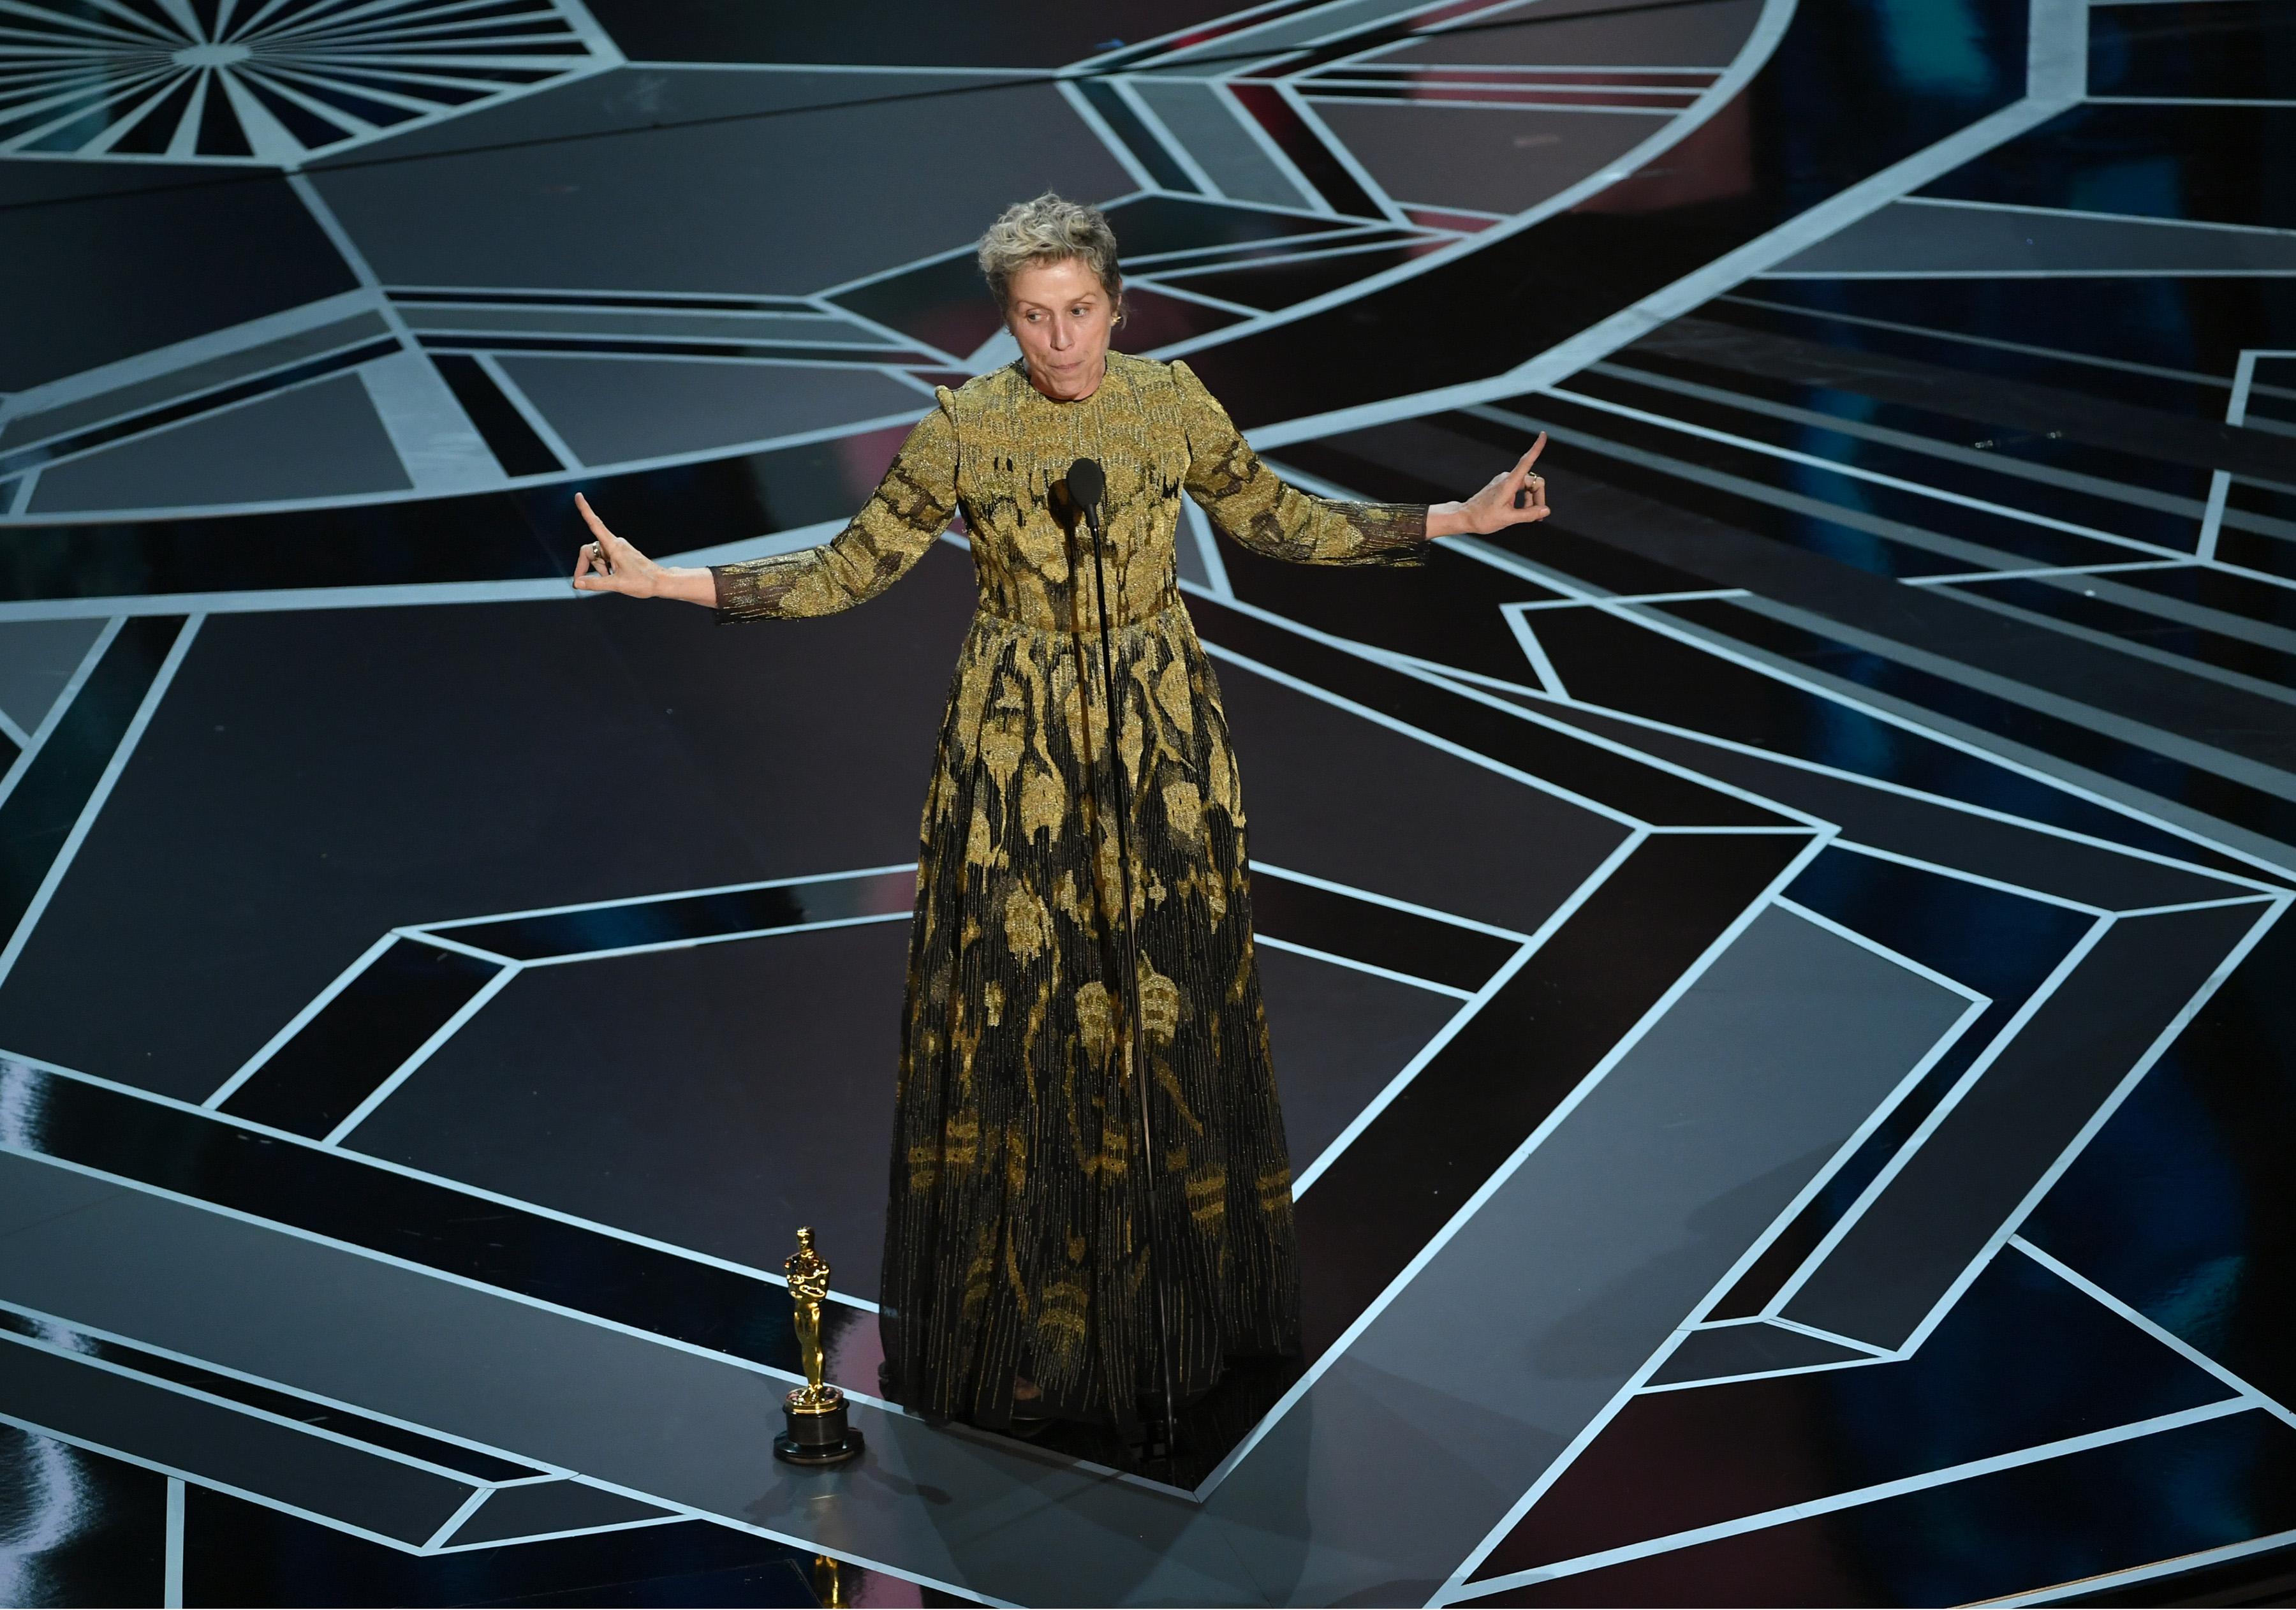 Frances McDormad riceve l'Oscar come miglior attrice per Tre manifesti a Ebbing, Missouri